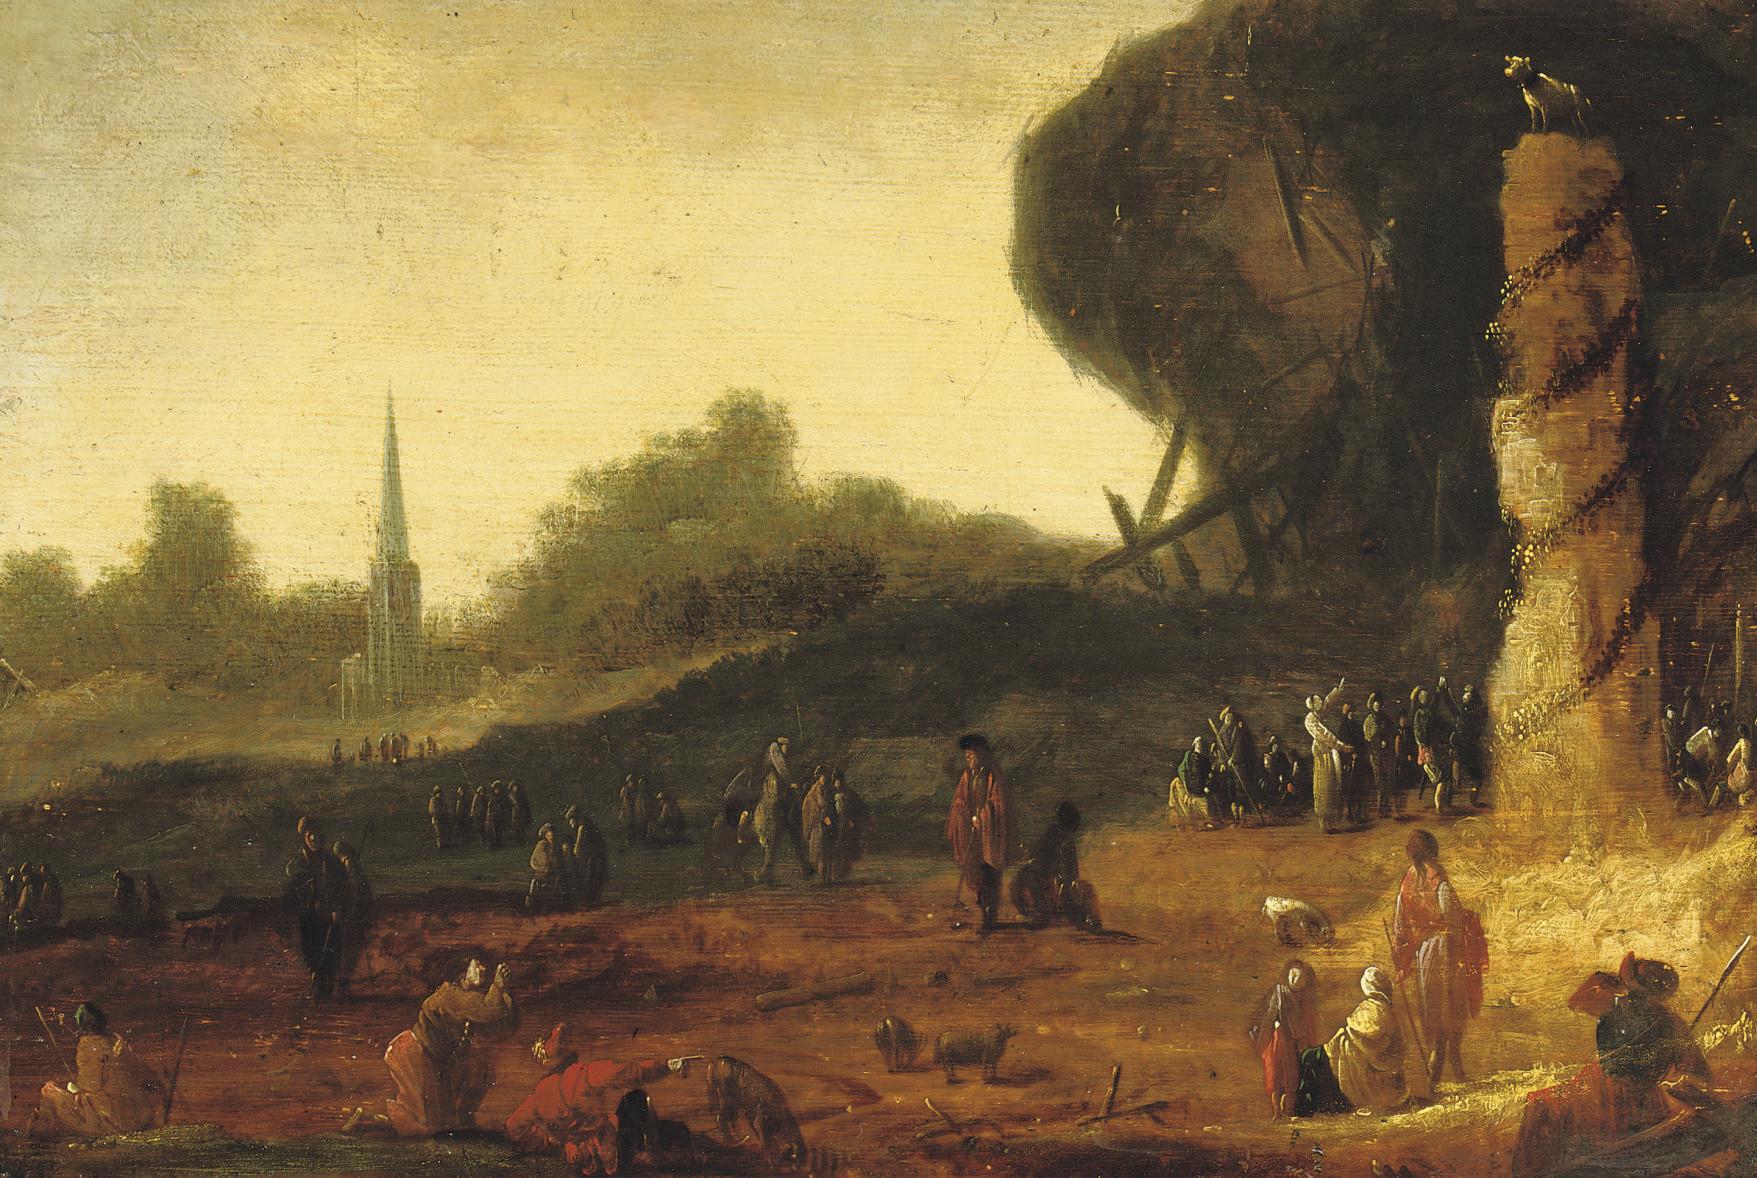 Reynier Jansz. (The Hague 1623